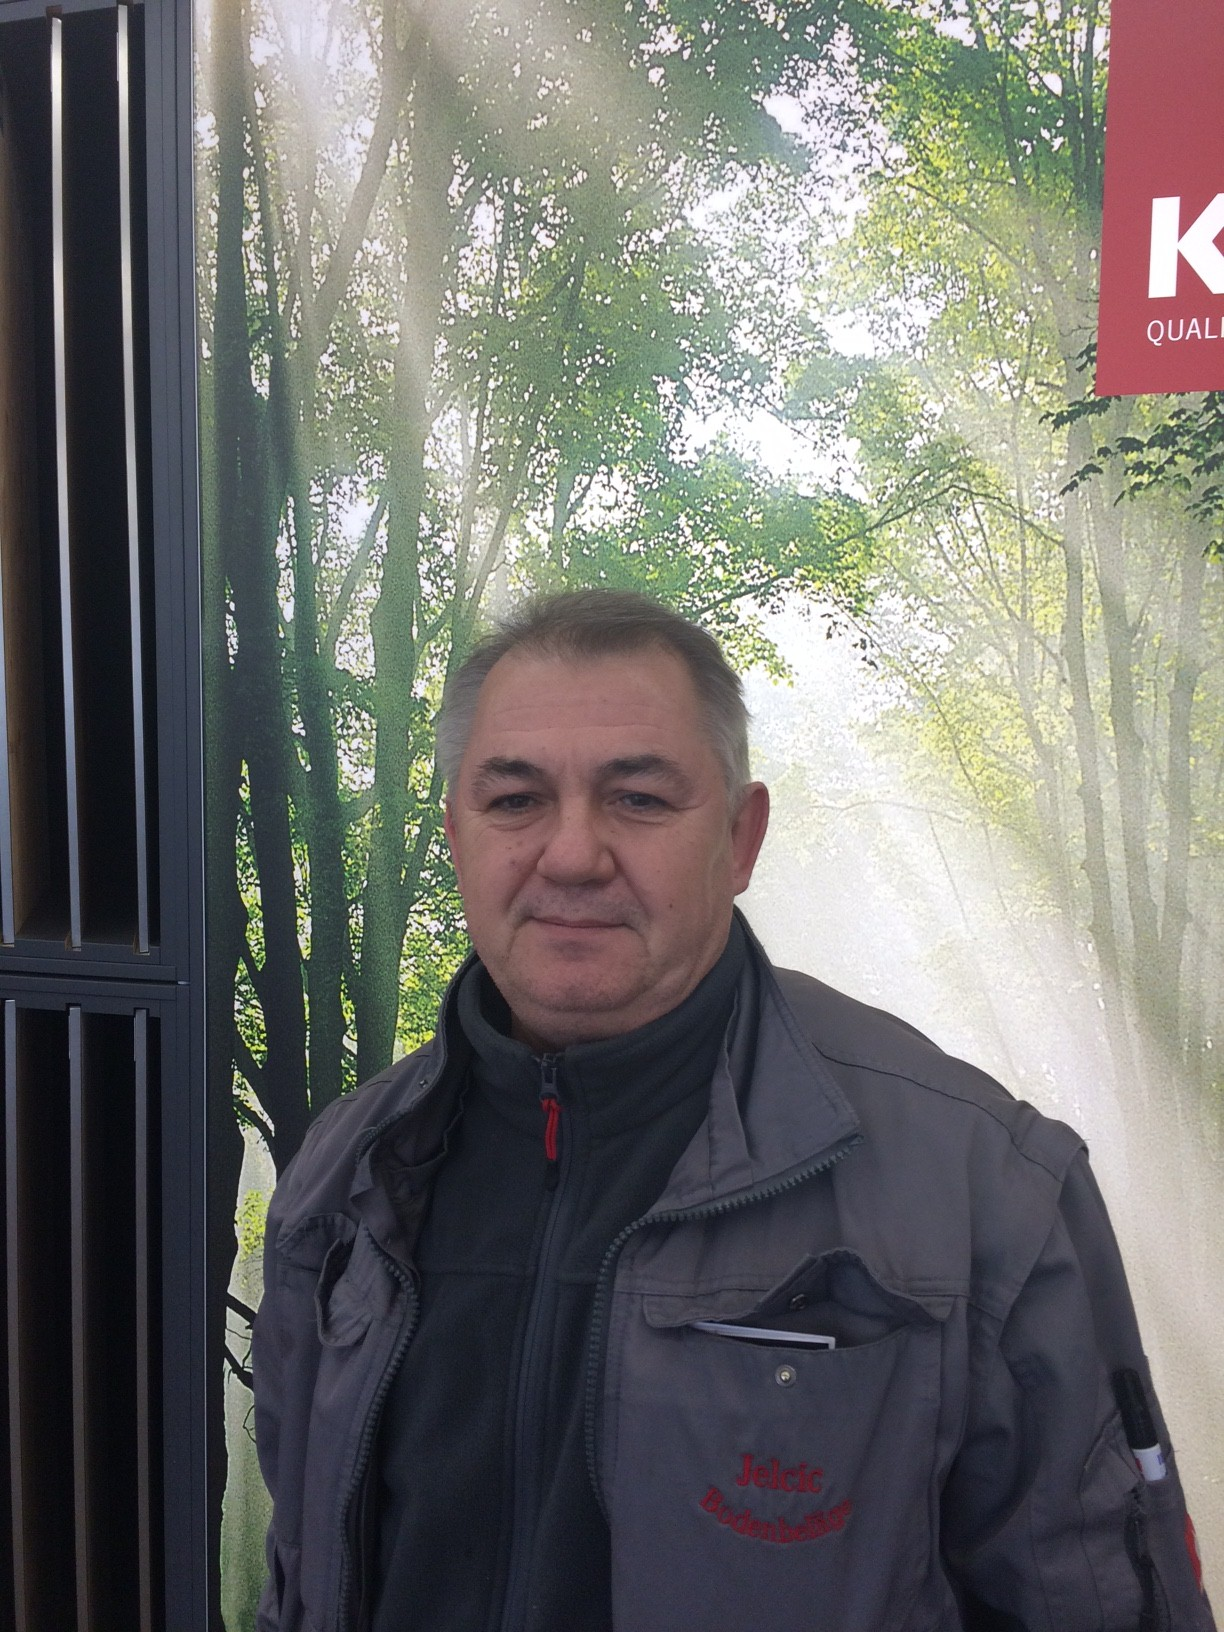 Zeljko Jelcic